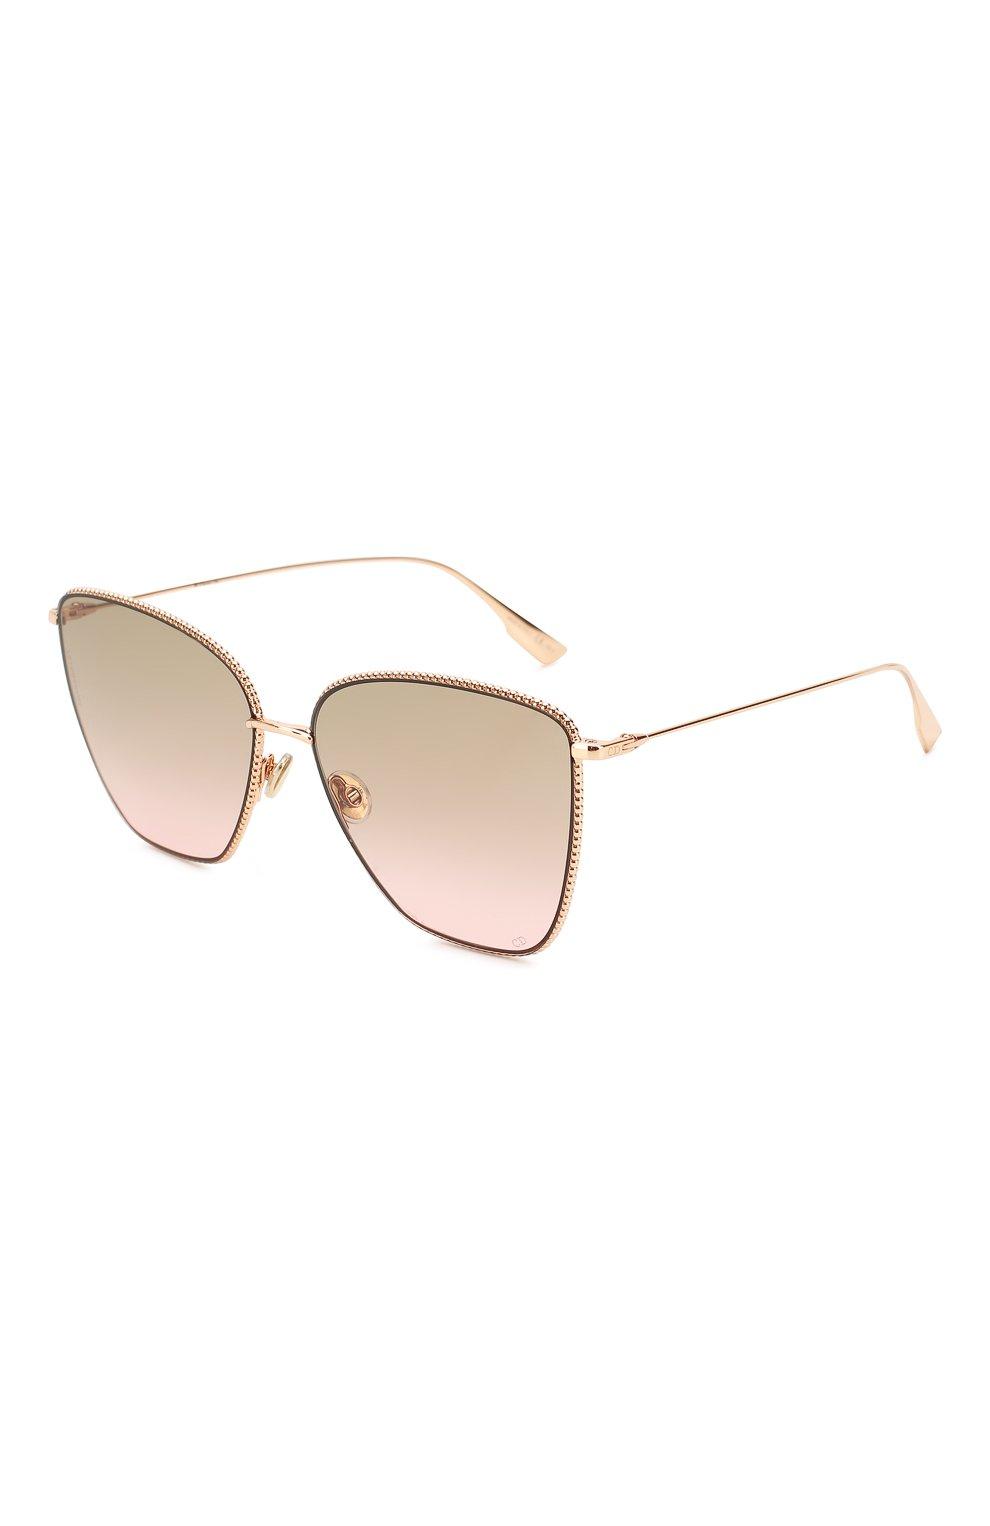 Женские солнцезащитные очки DIOR розового цвета, арт. DI0RS0CIETY1 DDB   Фото 1